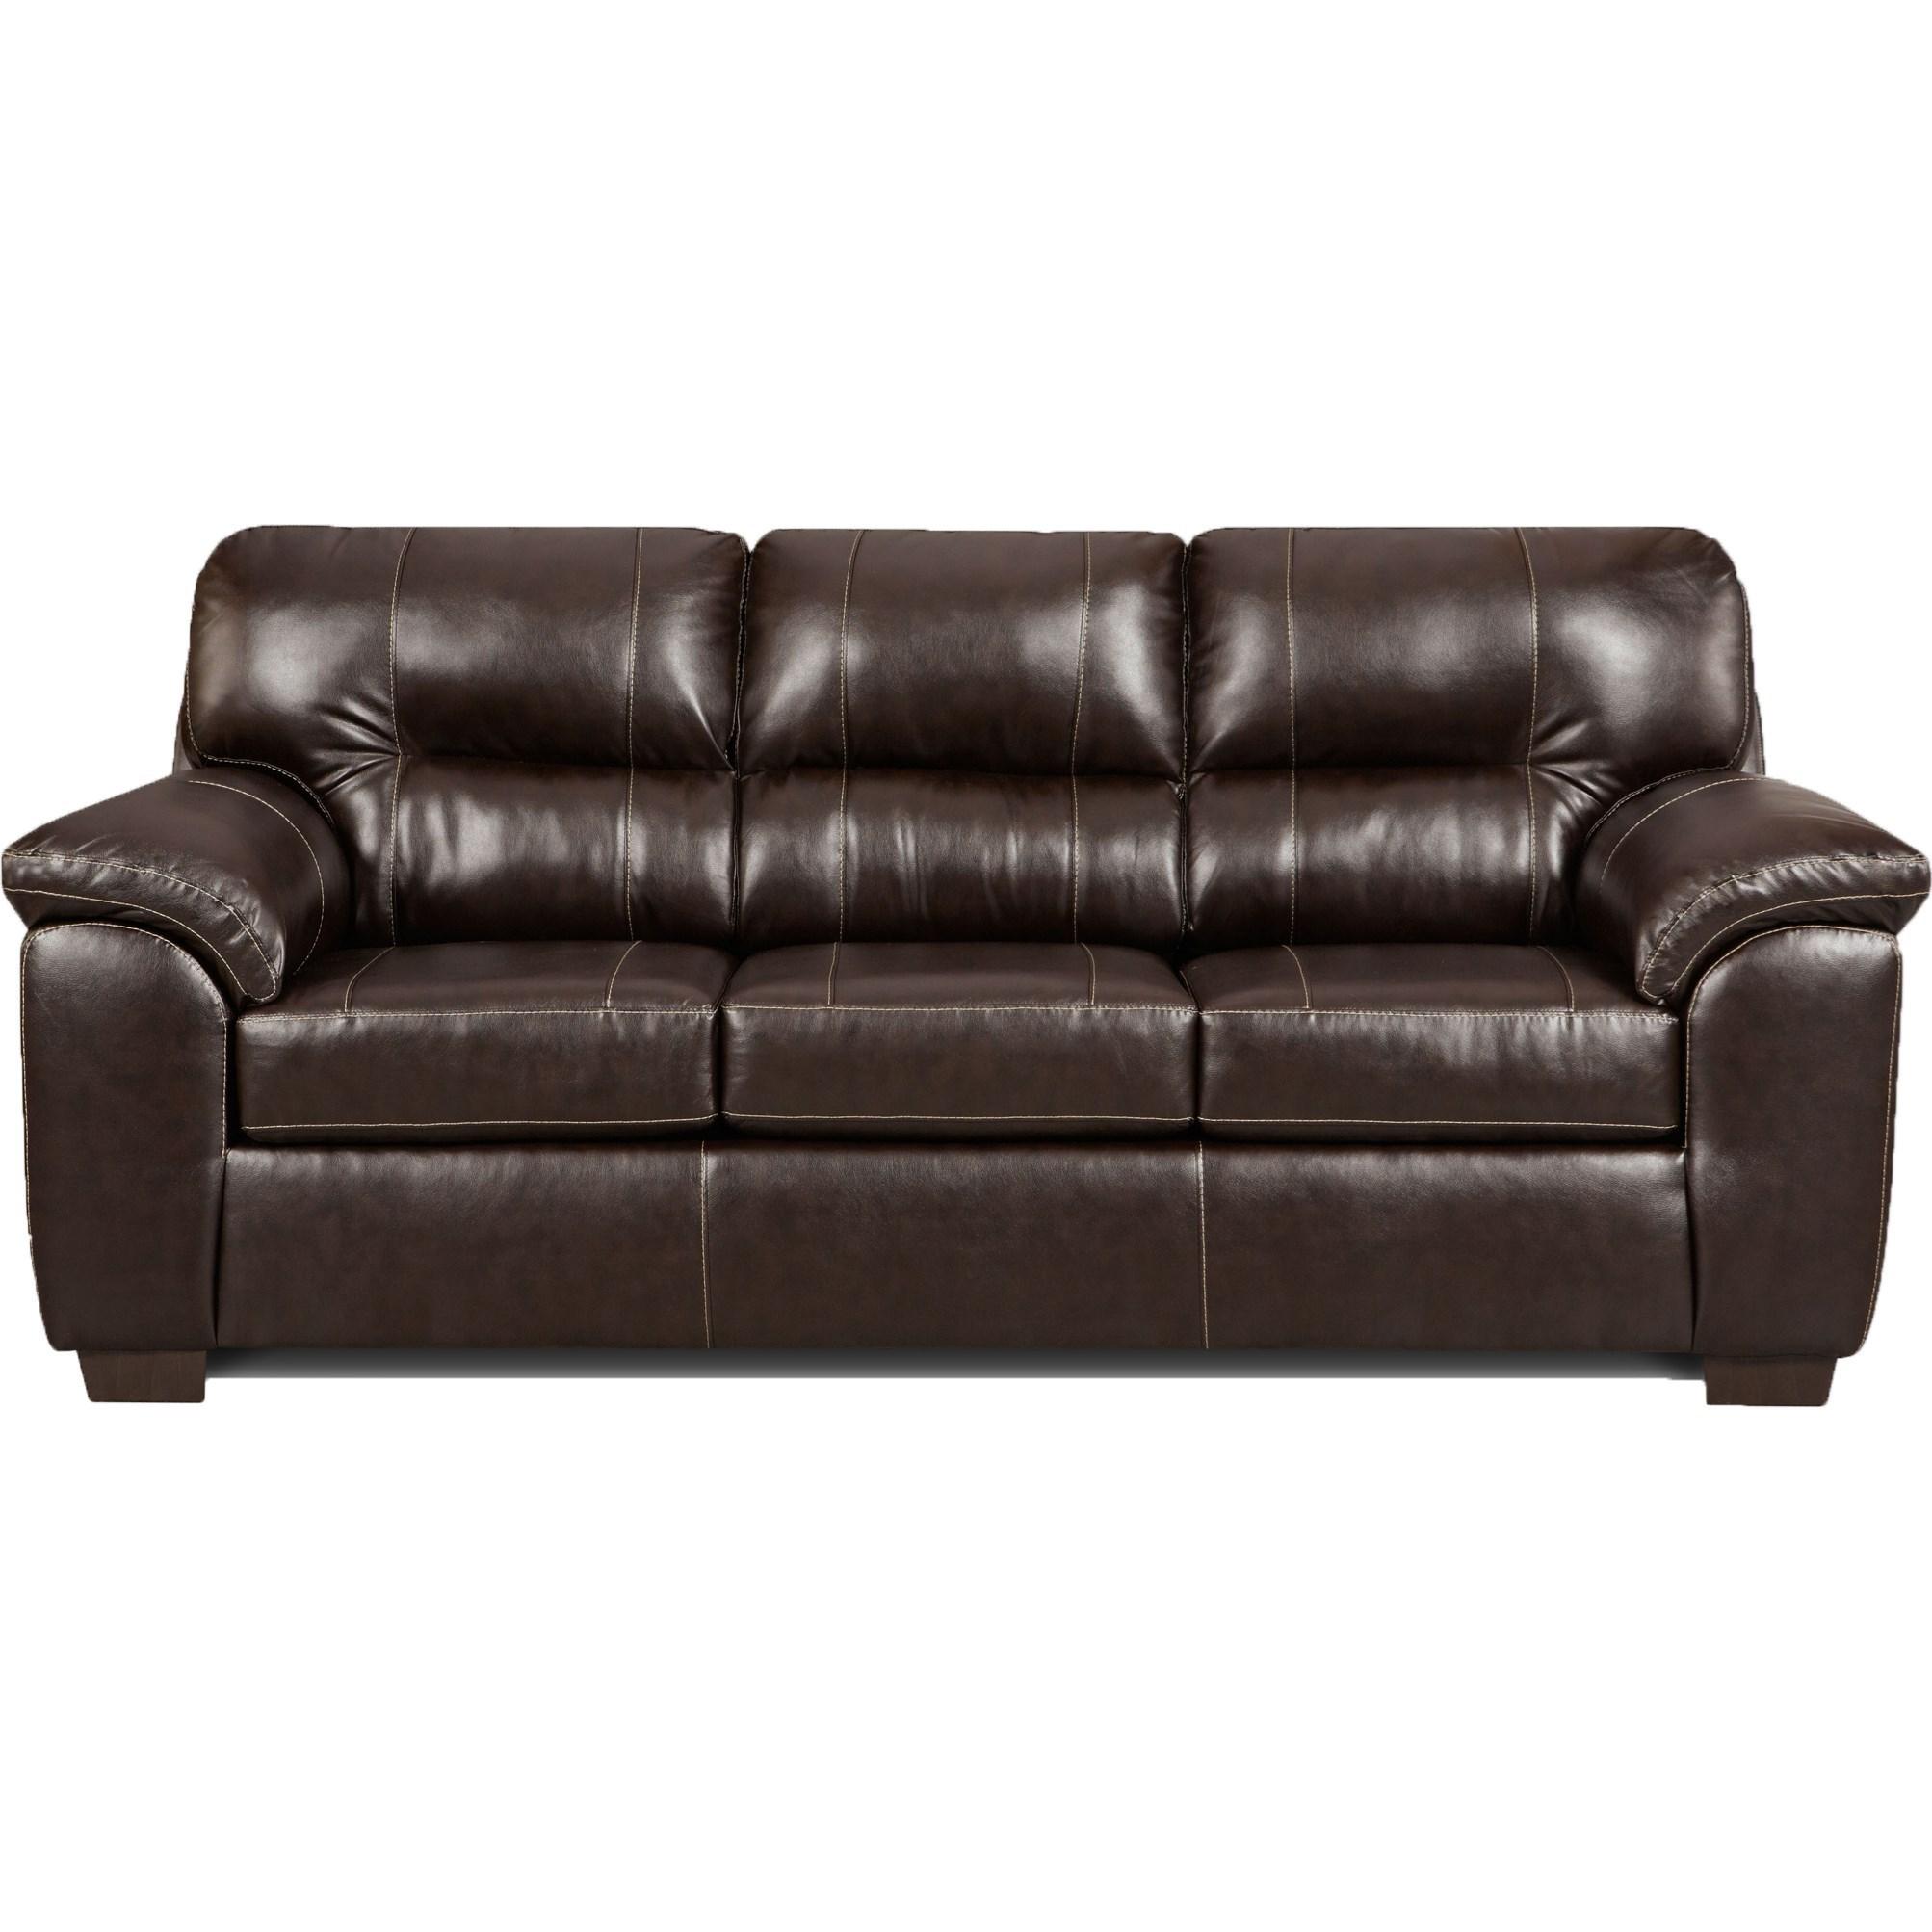 Sofa Affordable Affordable Furniture 5950 Silverton Pewter